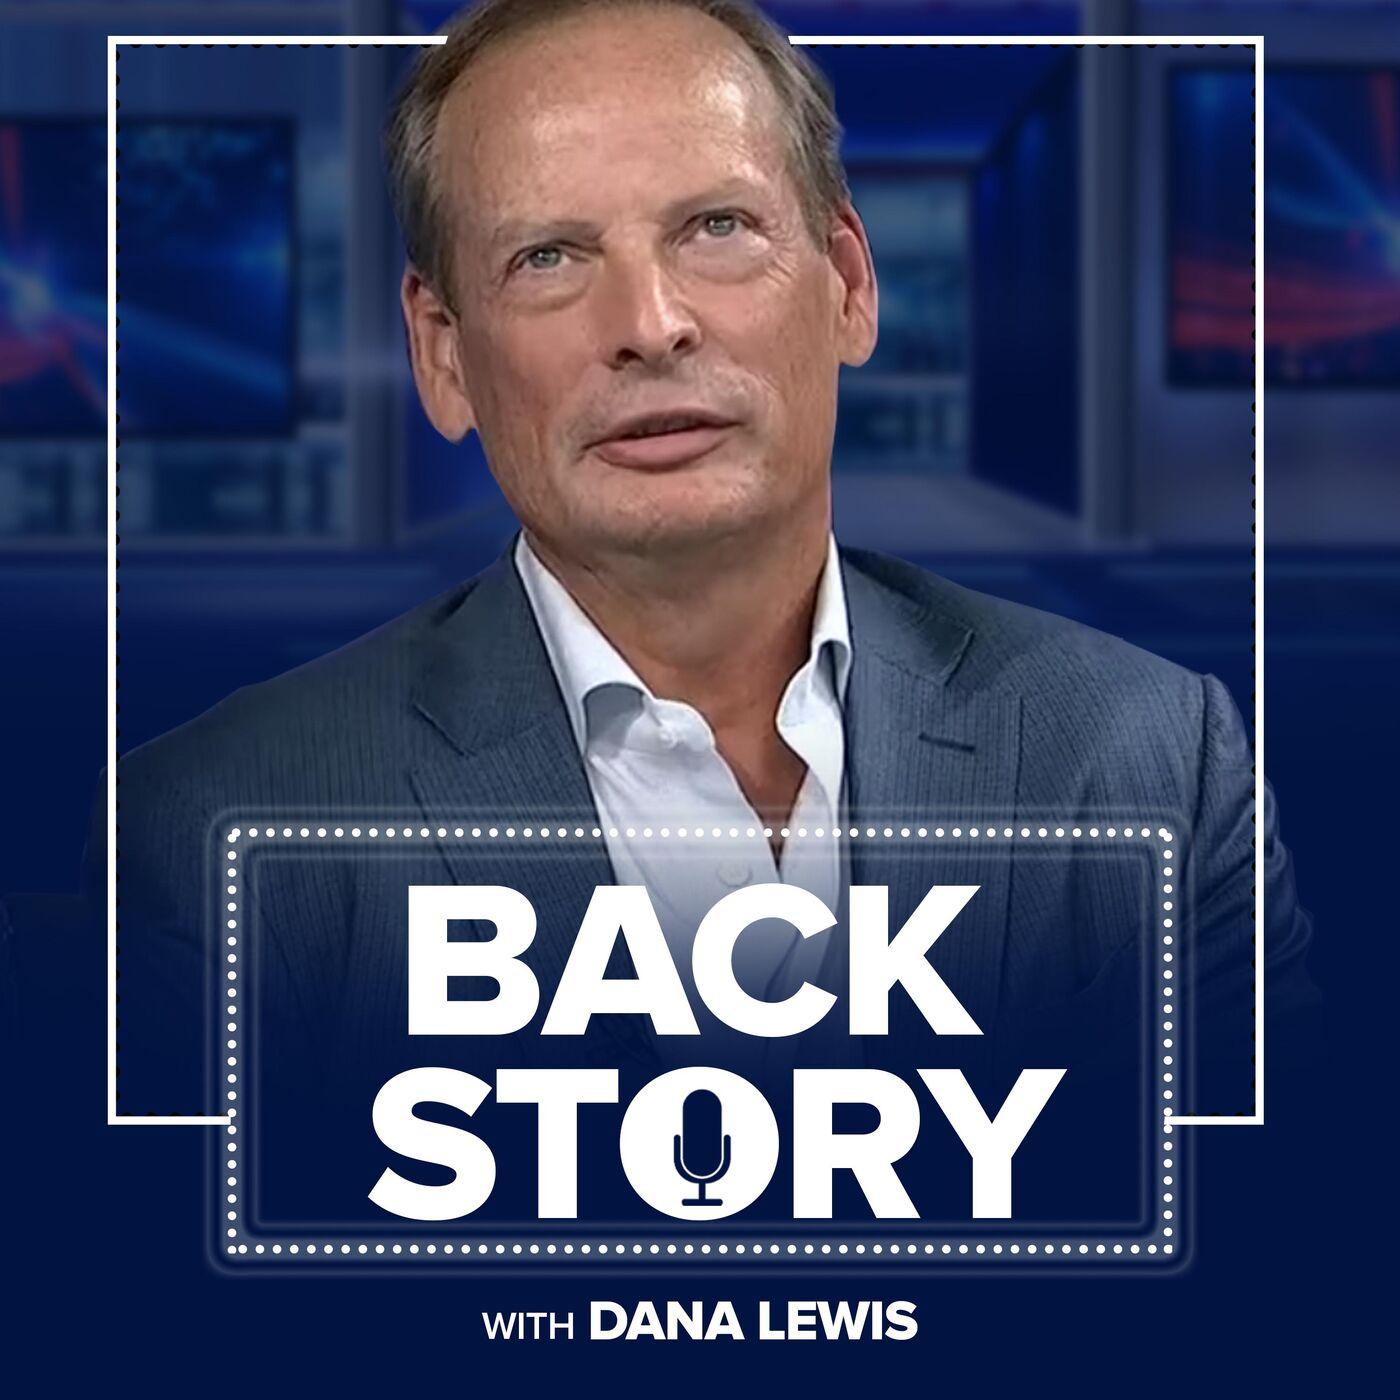 Back Story with Dana Lewis: Submarines to Australia